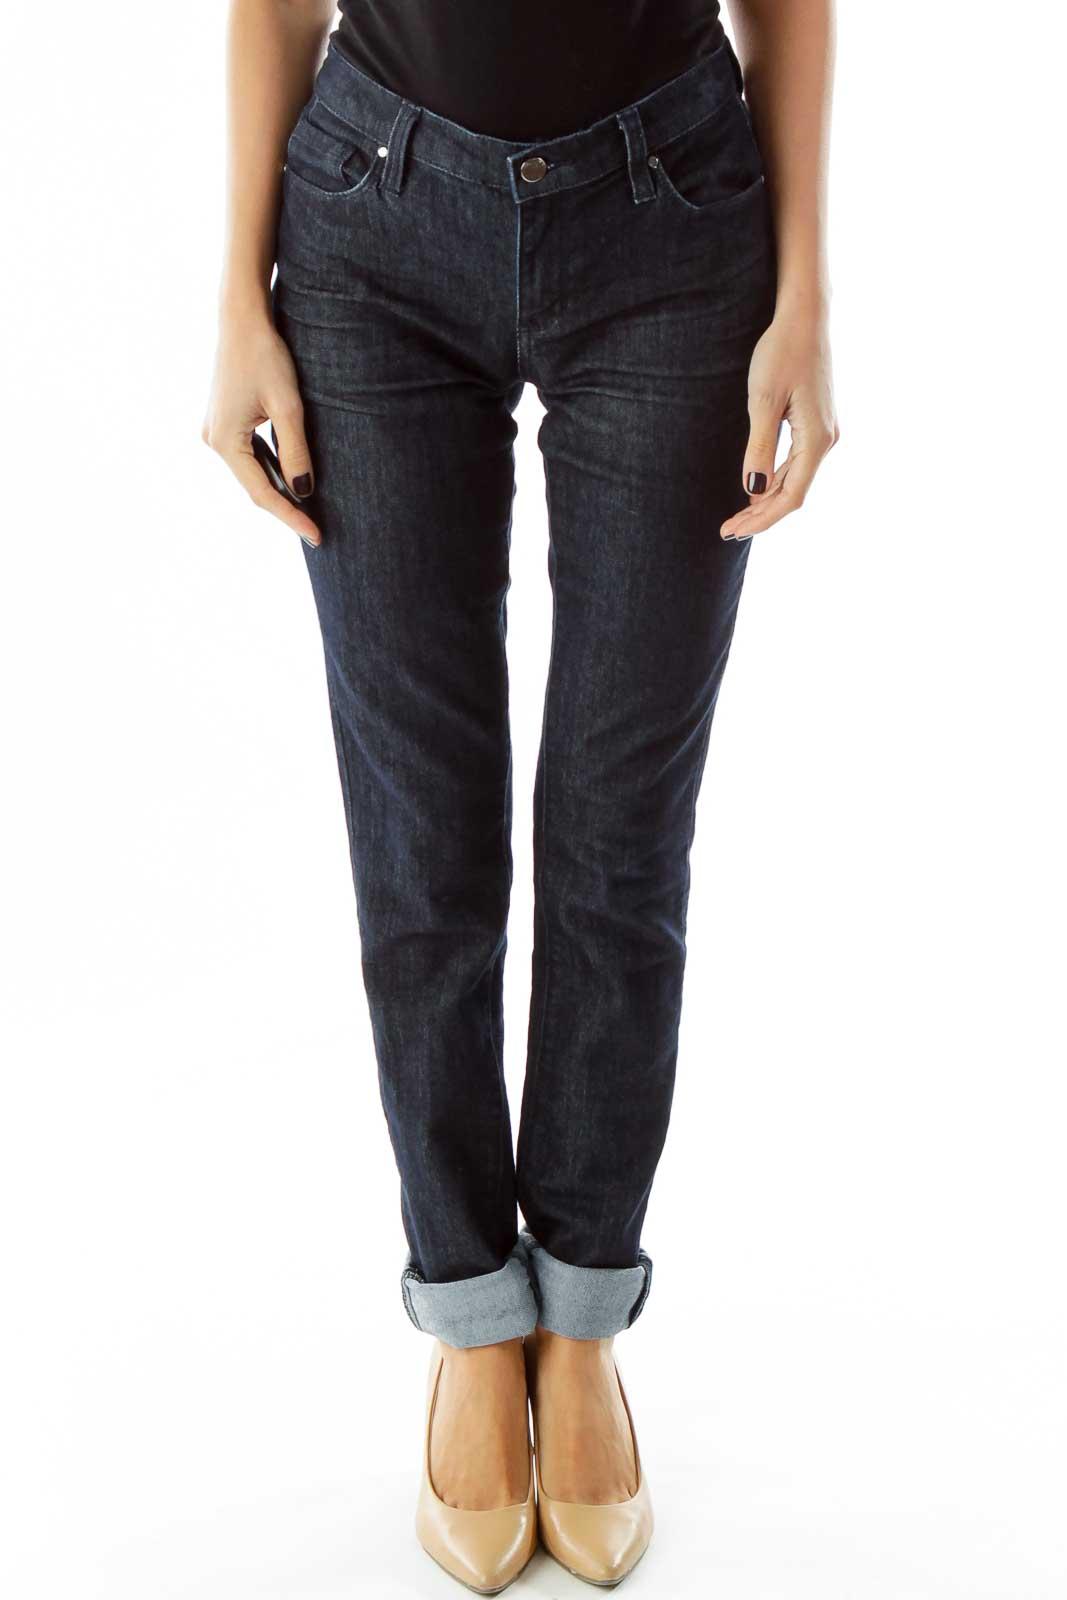 Navy Denim Skinny Jeans Front